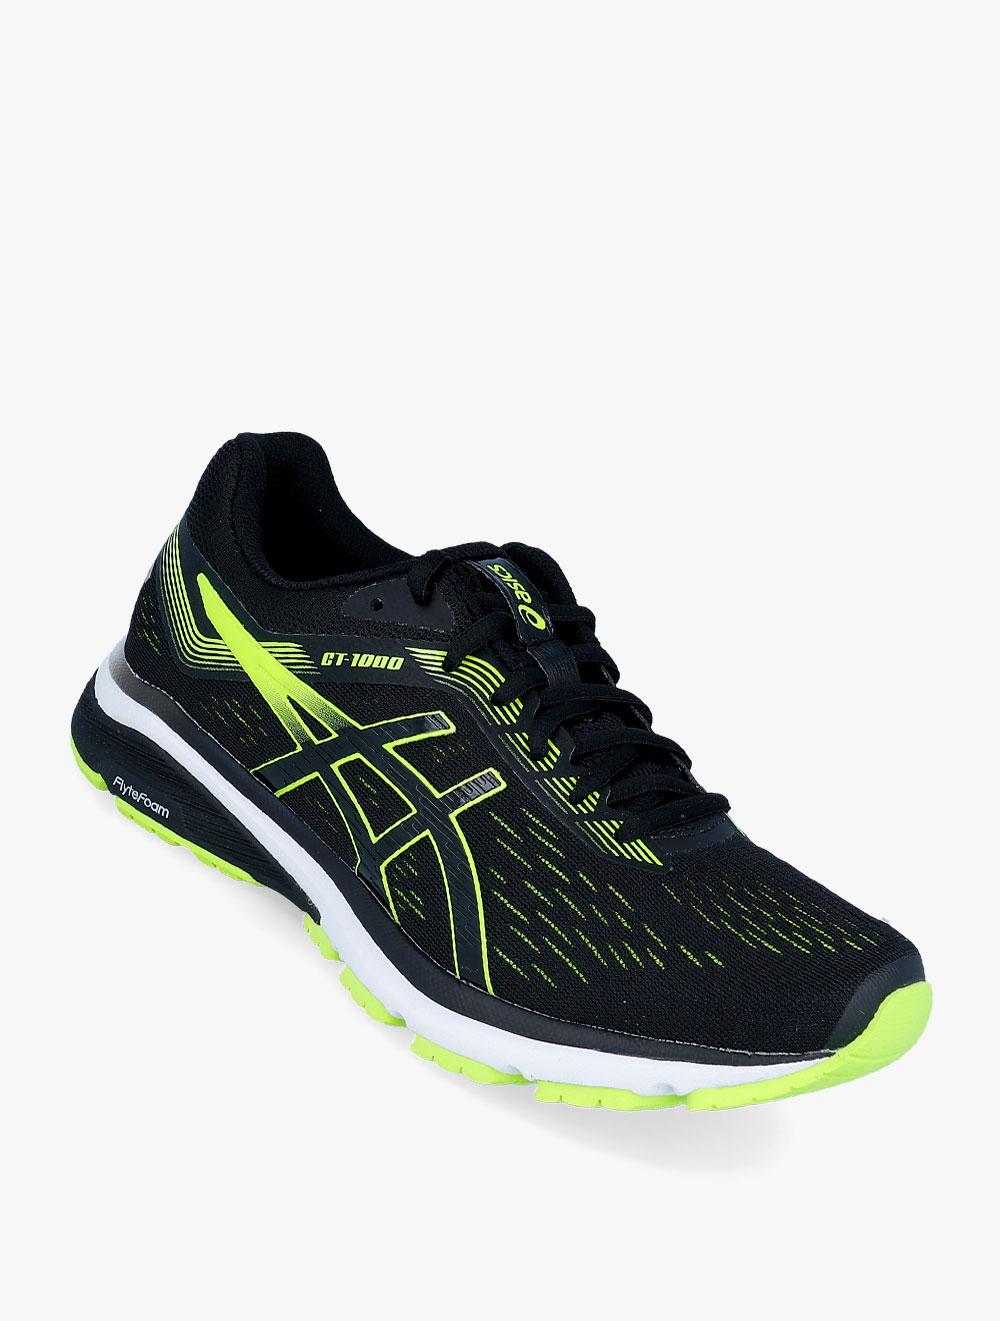 Black ASICS GT-1000 7 Running Shoes